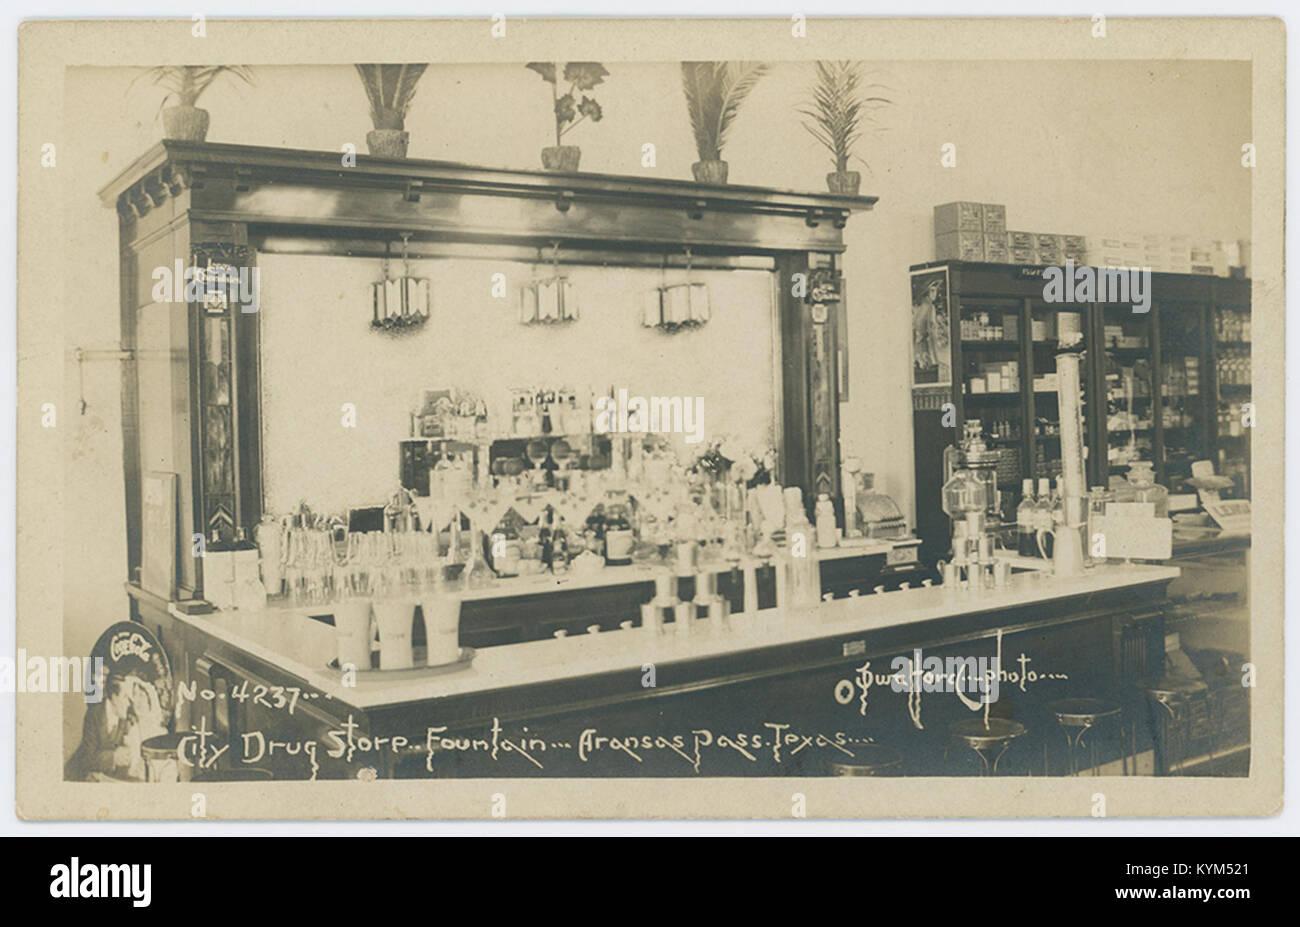 City Drug Store Fountain, Aransas Pass, Texas 35710423321 o - Stock Image